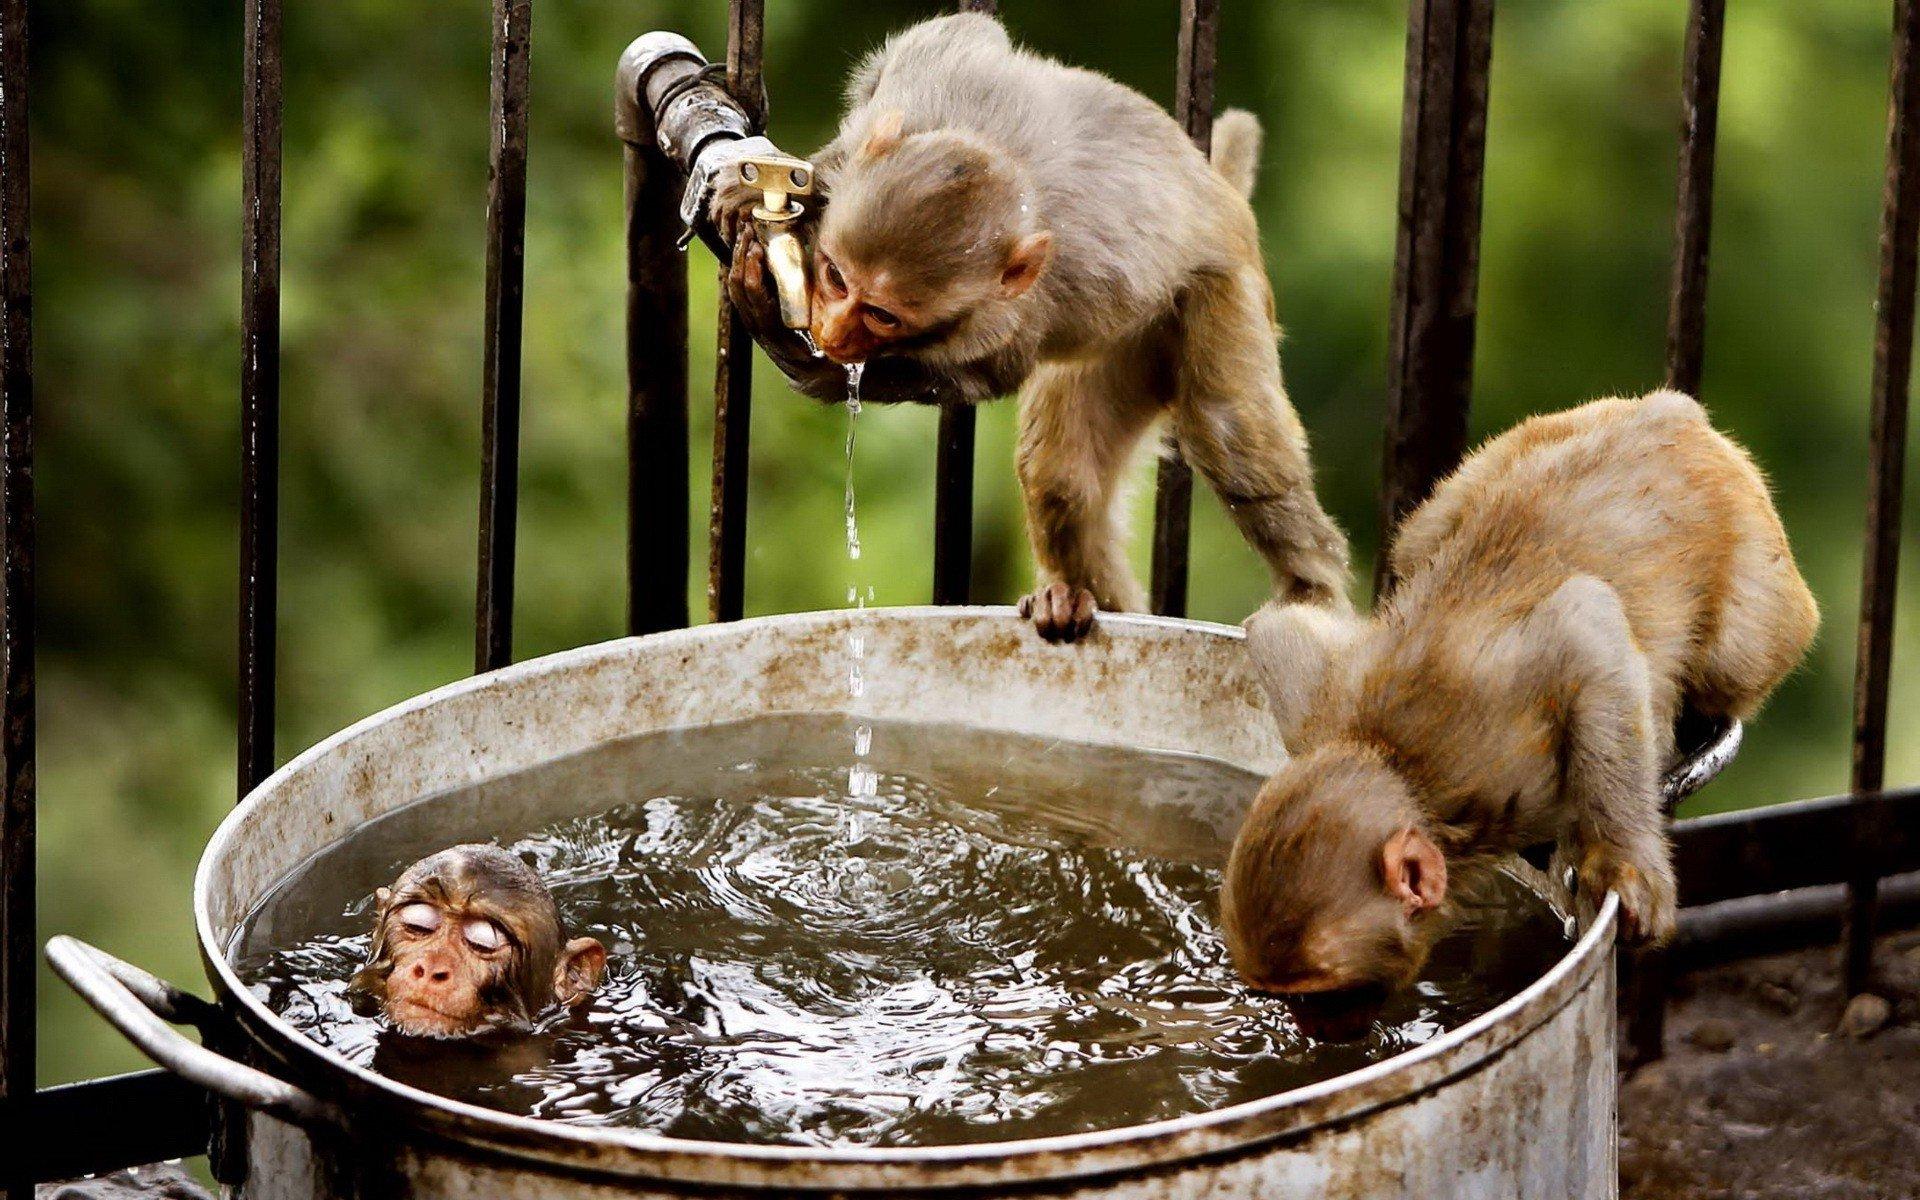 Monkey Hot tub party